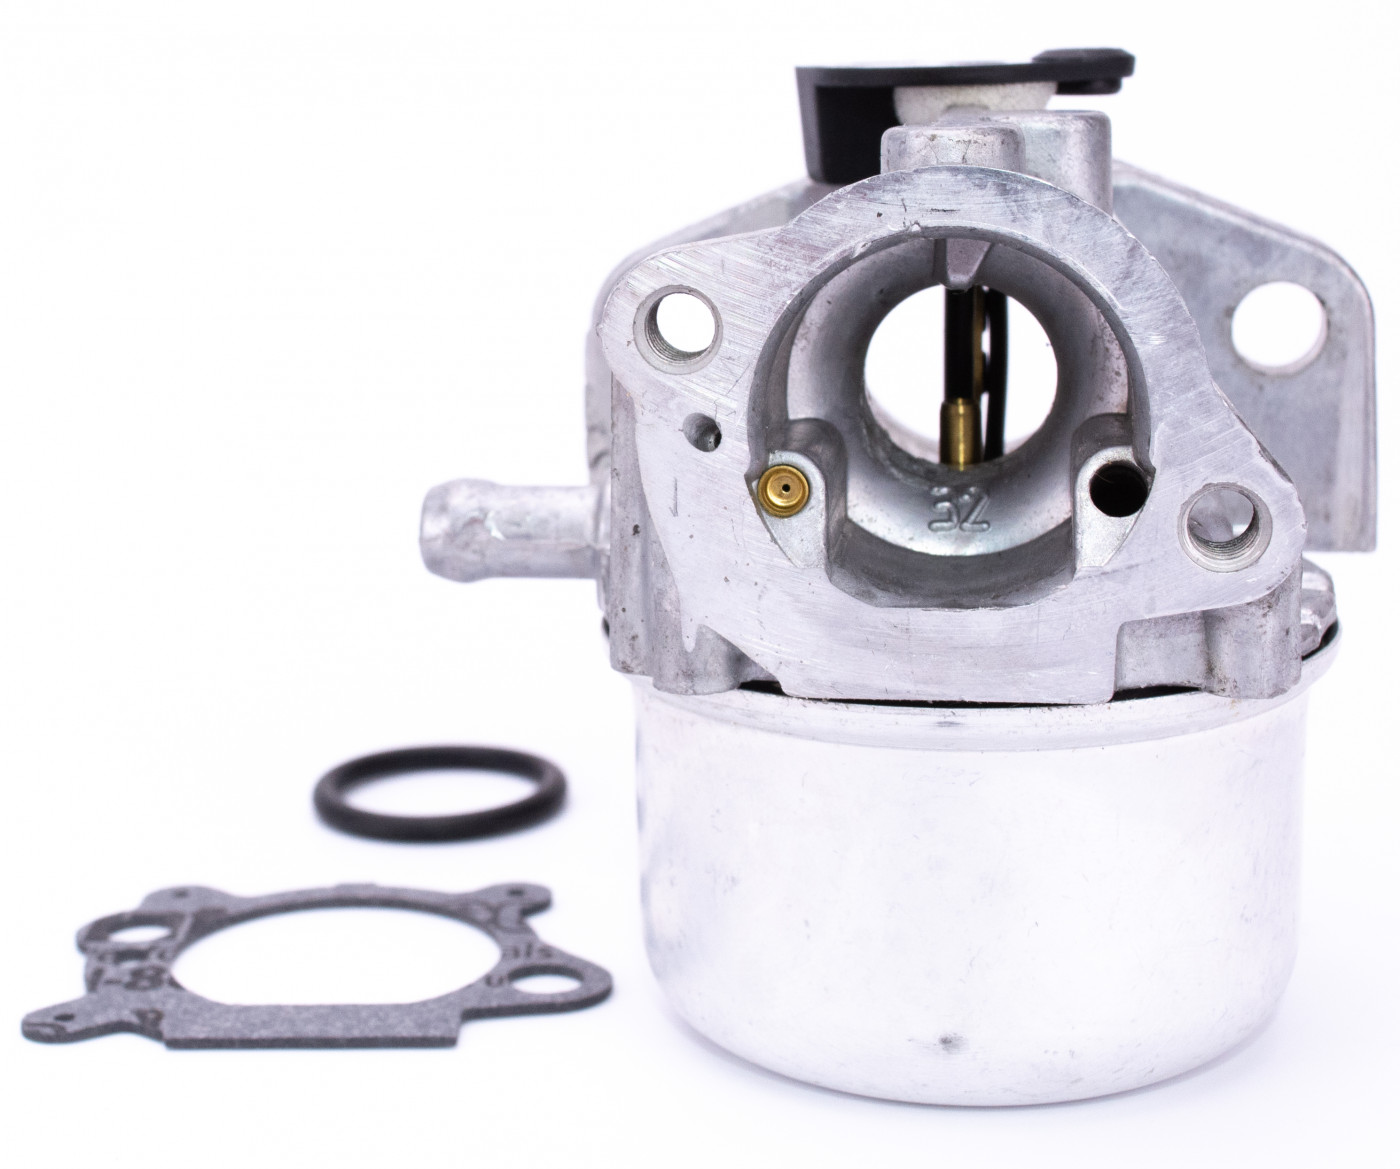 Karburátor BRIGGS&STRATTON PULSA PRIMA SERIA 600 QUANTUM Originálný diel 799868